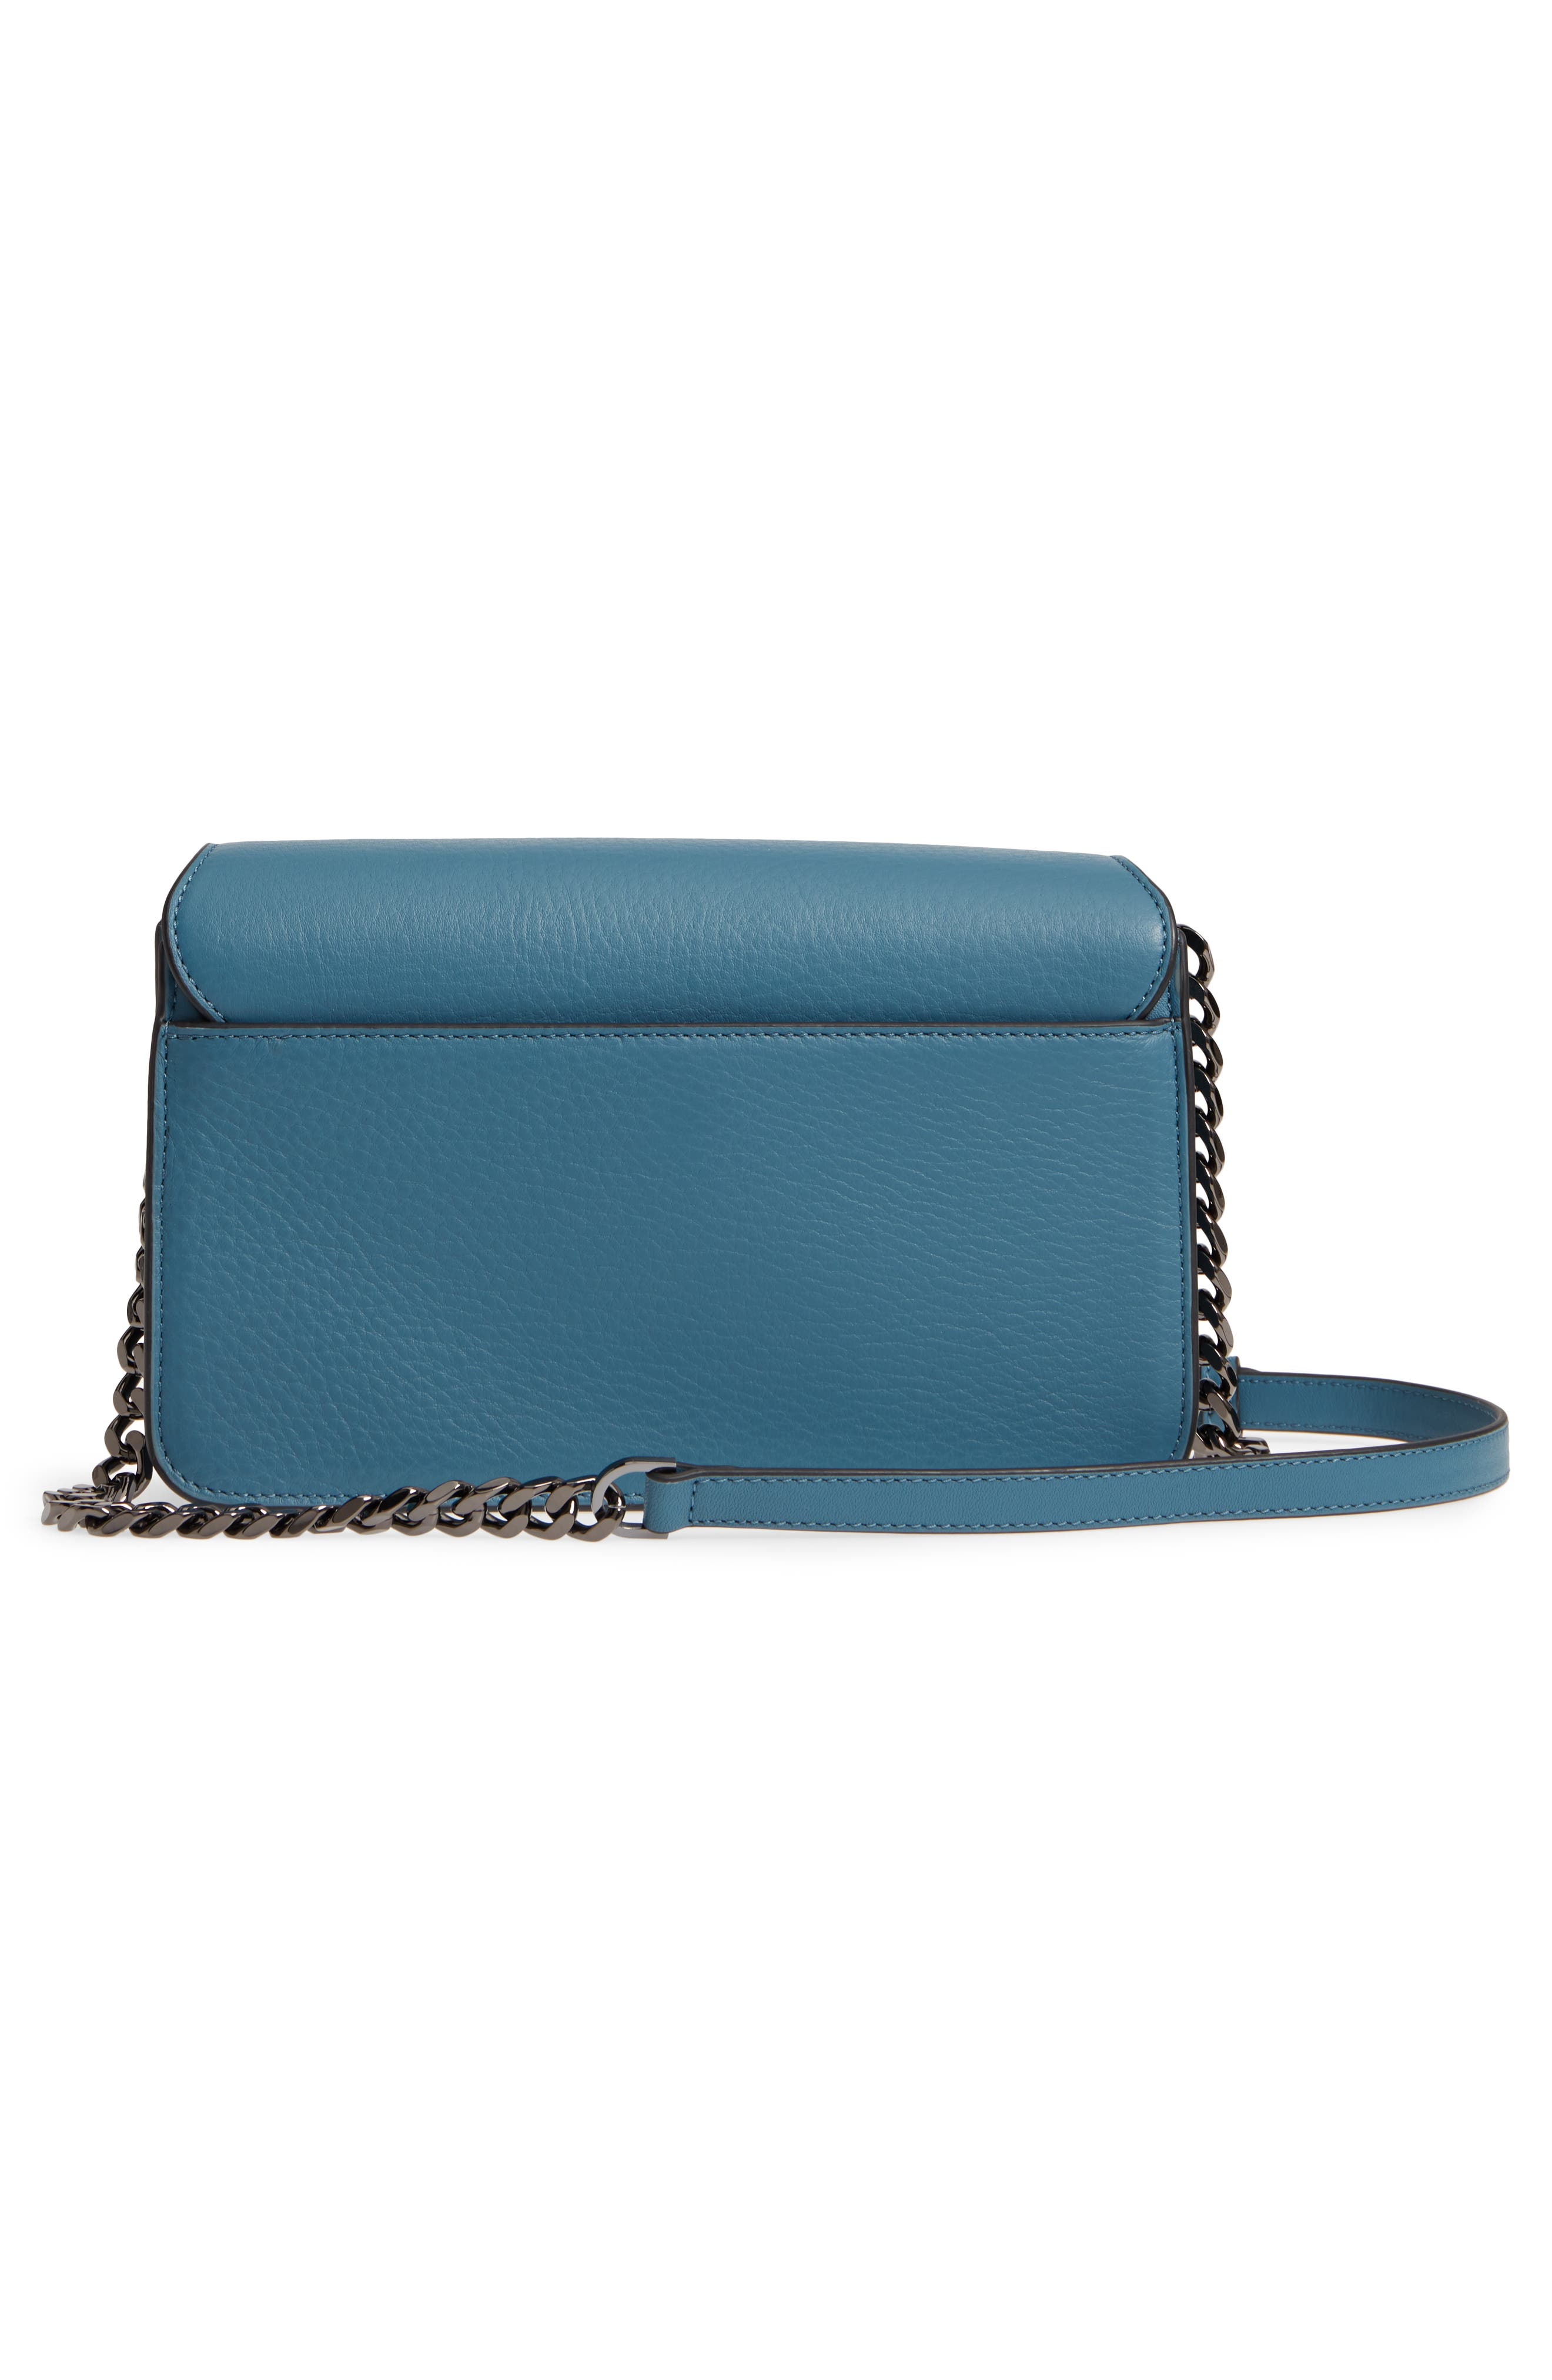 Cortney Nappa Leather Shoulder/Crossbody Bag,                             Alternate thumbnail 11, color,